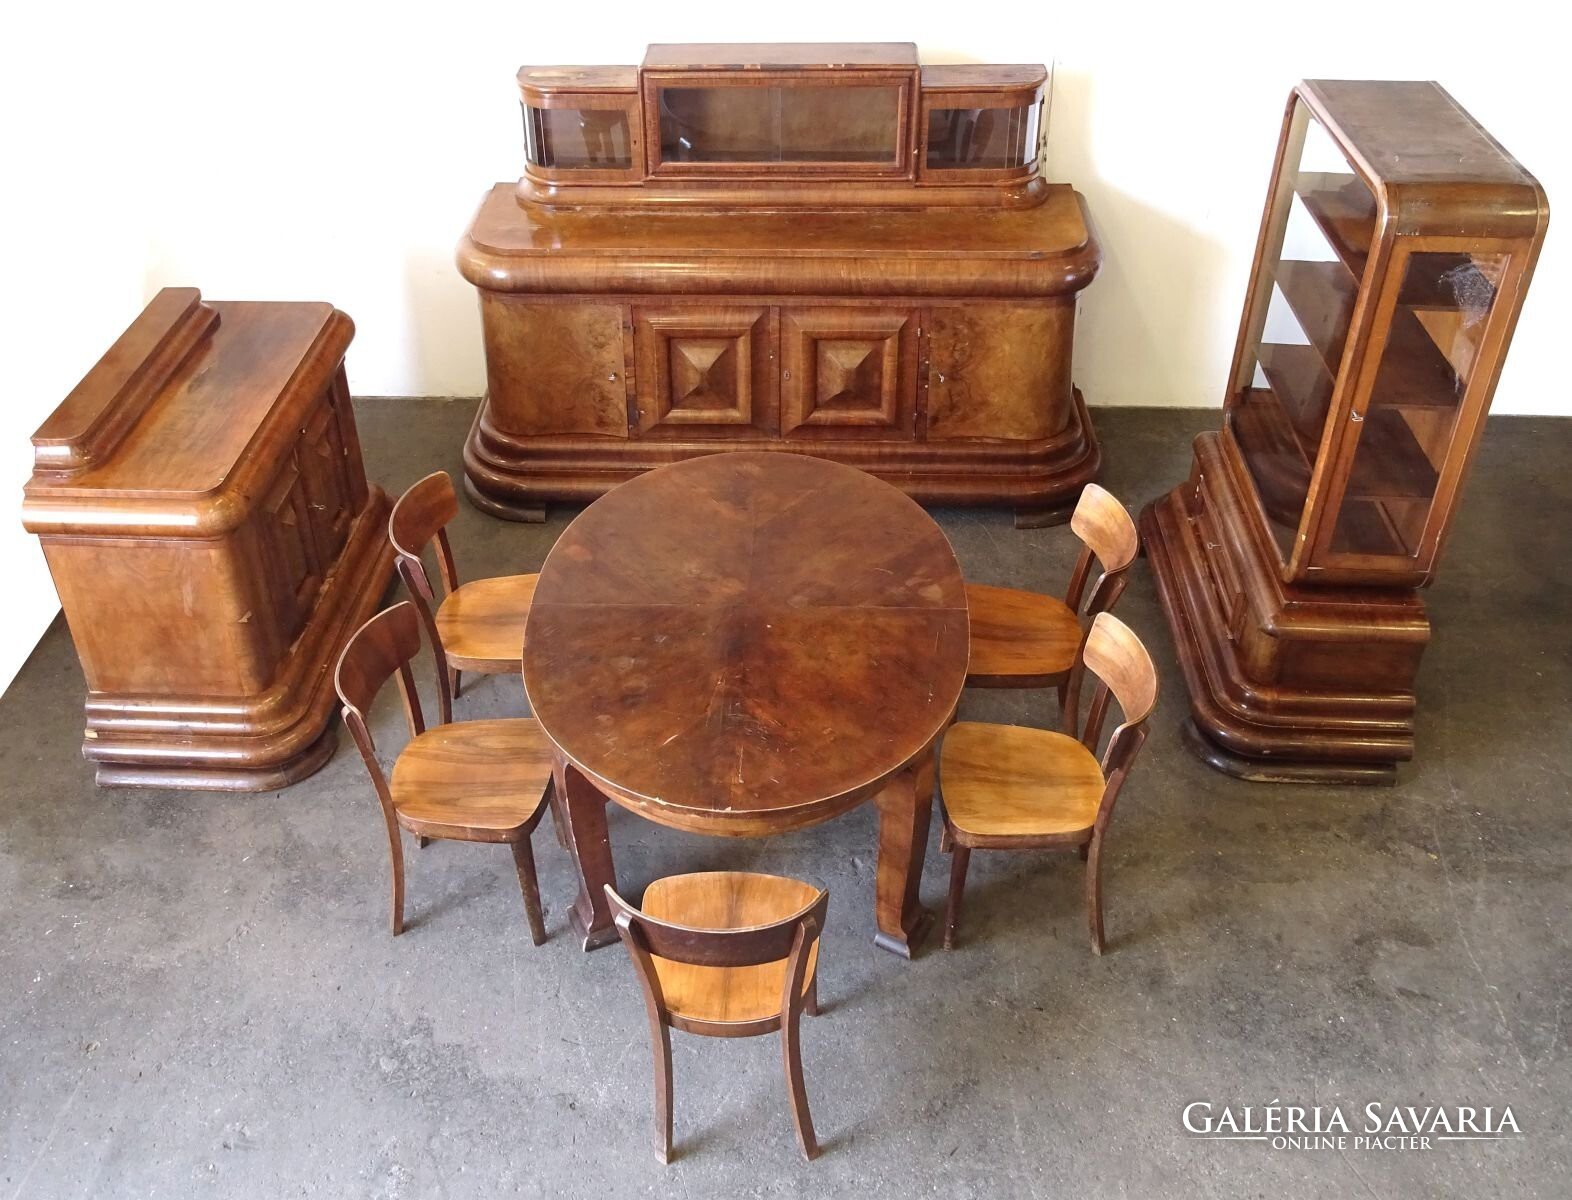 0S620 Antik 9 darabos art deco ebédlő garnitúra Bútor